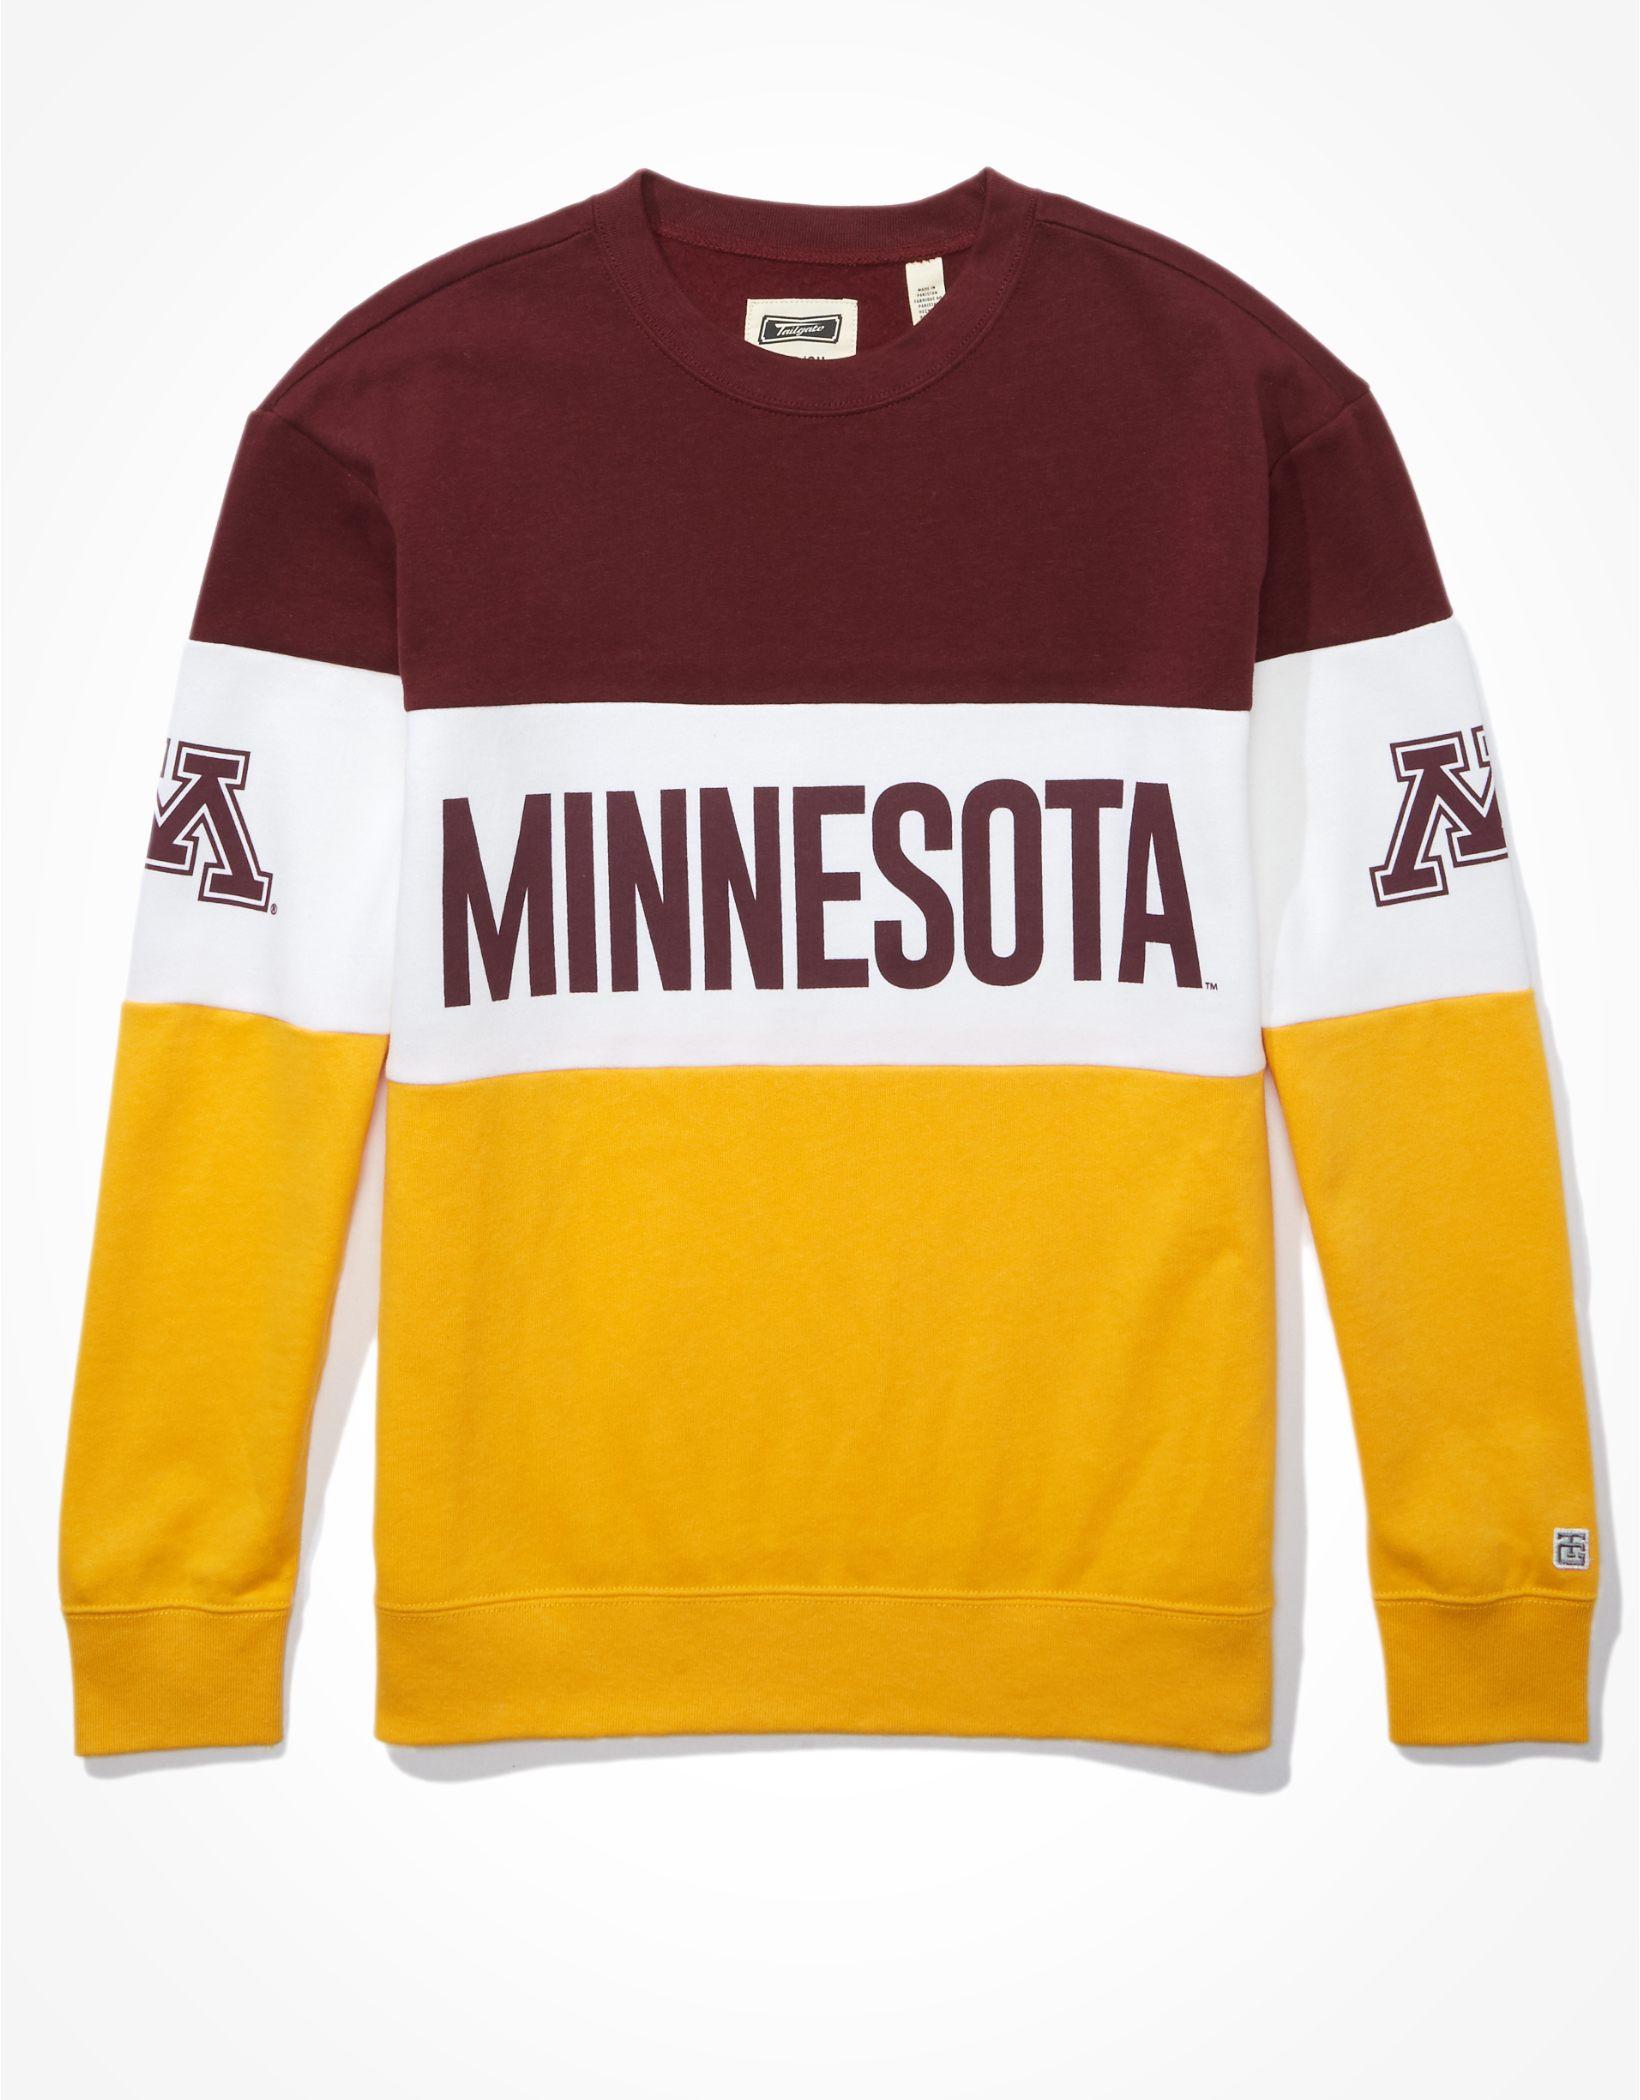 Tailgate Women's Minnesota Golden Gophers Colorblock Sweatshirt